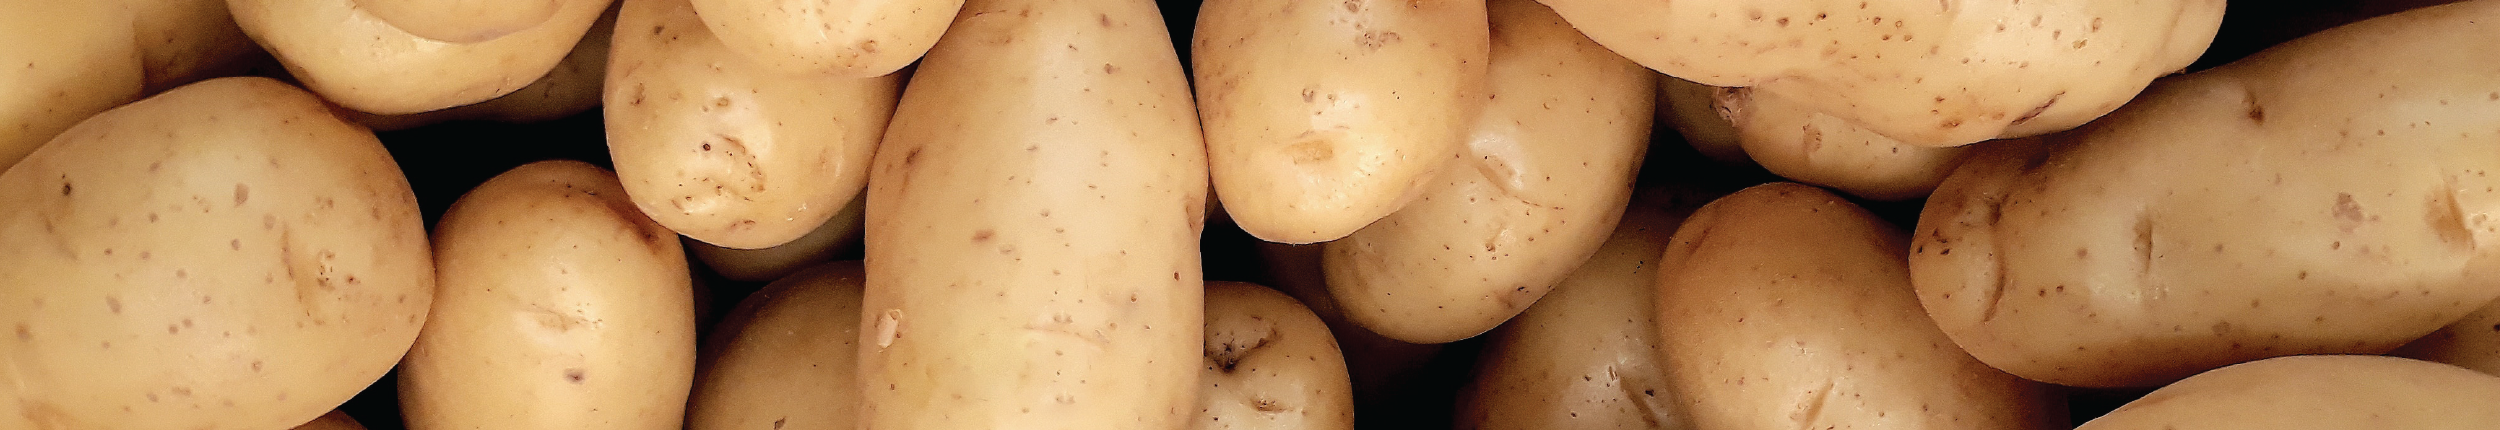 potatoes on the dirty dozen